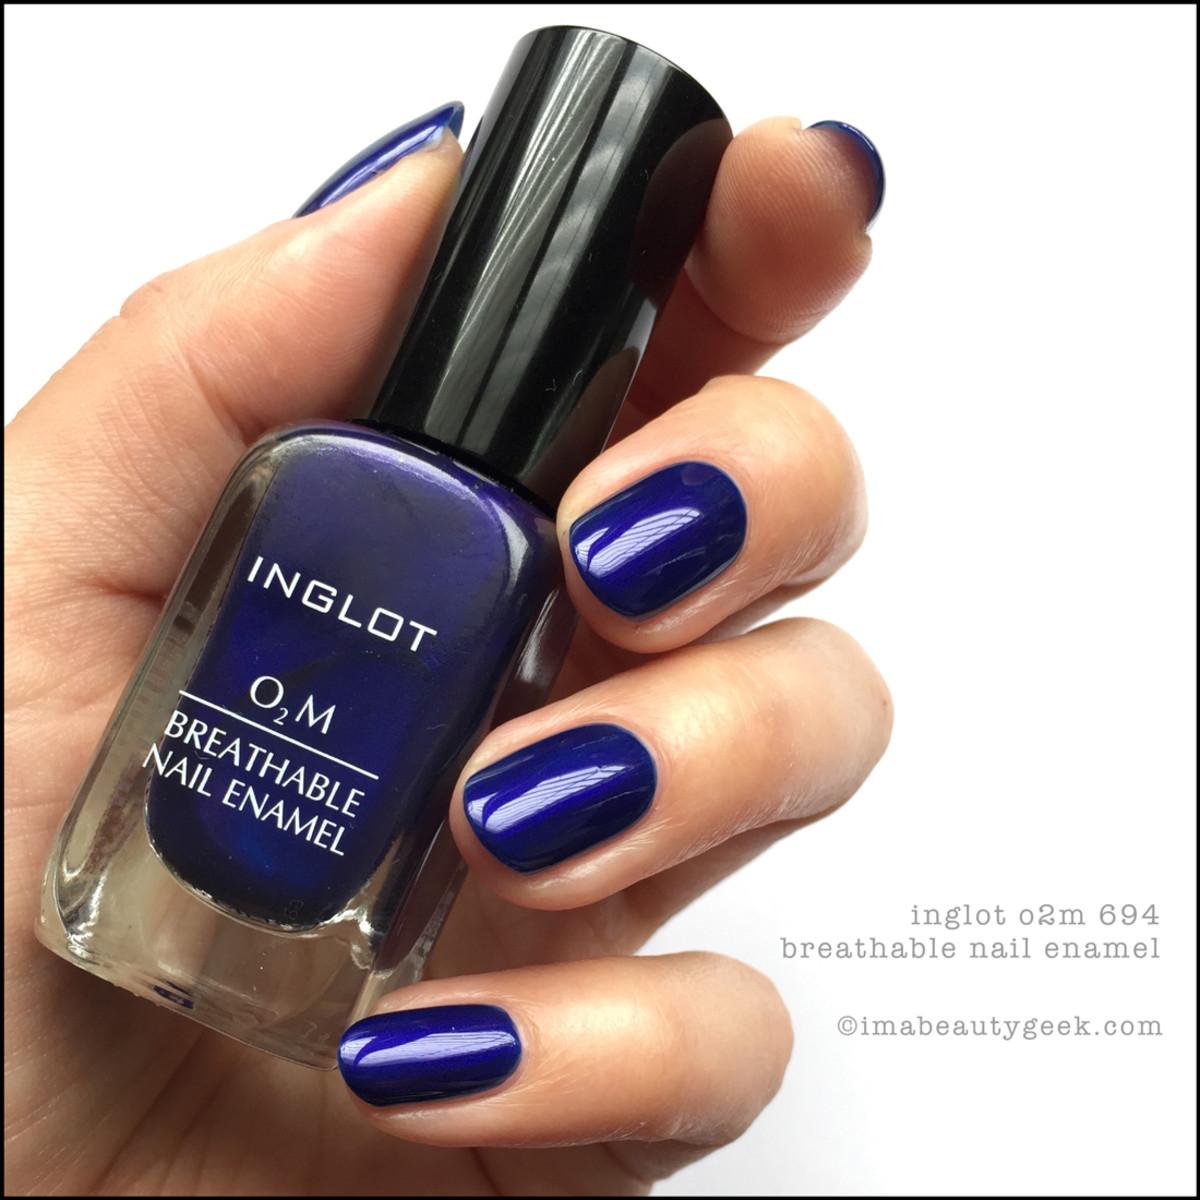 Inglot o2m Breathable Nail Enamel_Inglot 694 Nail Polish